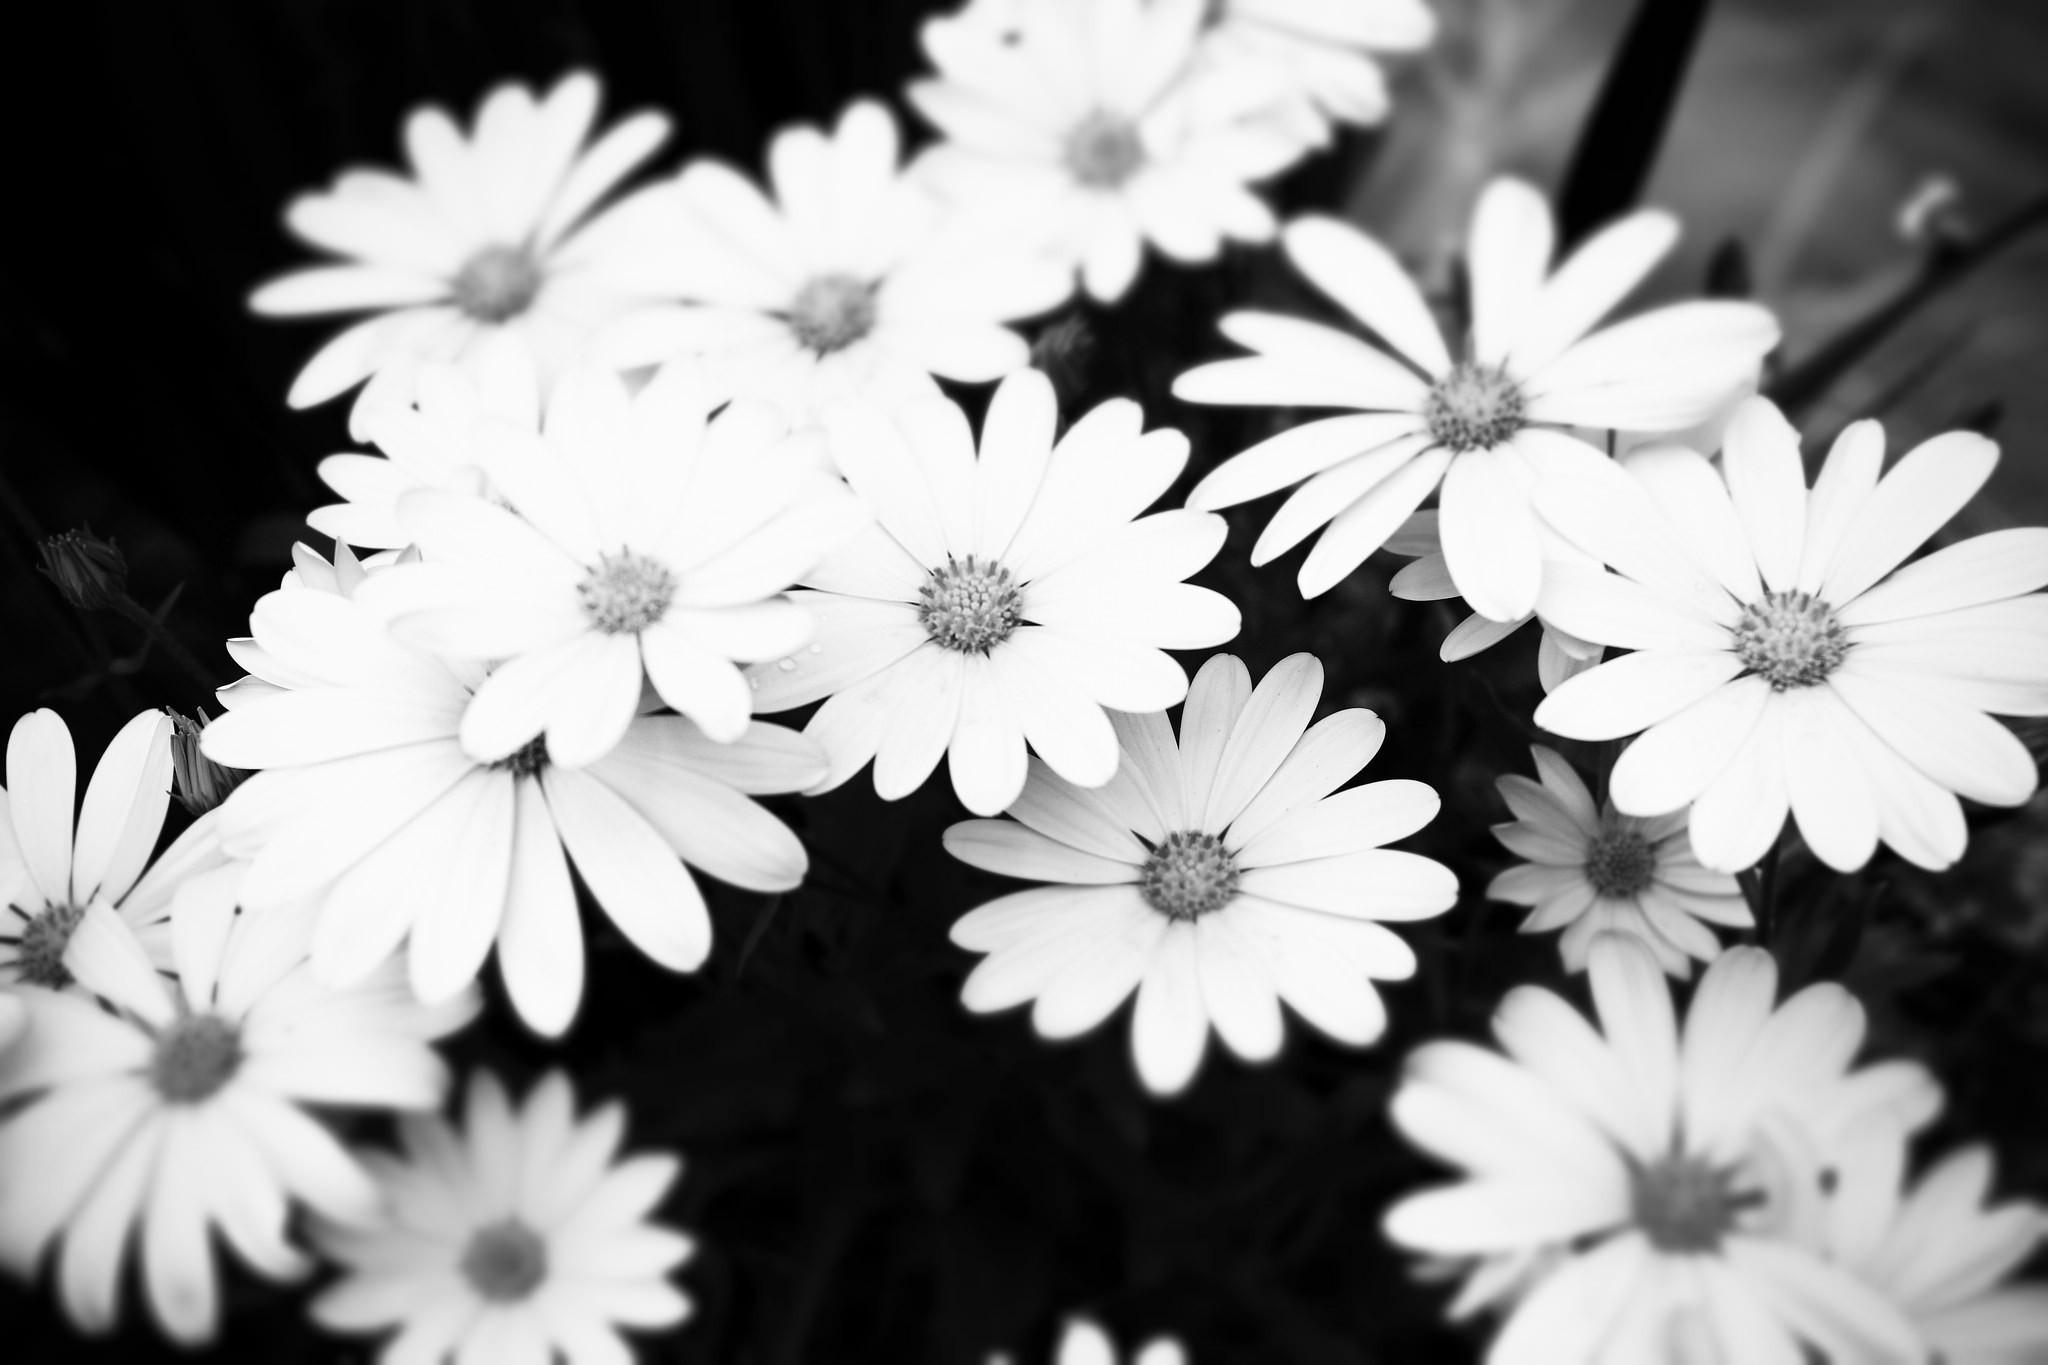 Aesthetic Wallpaper Flowers Black And White Largest Wallpaper Portal